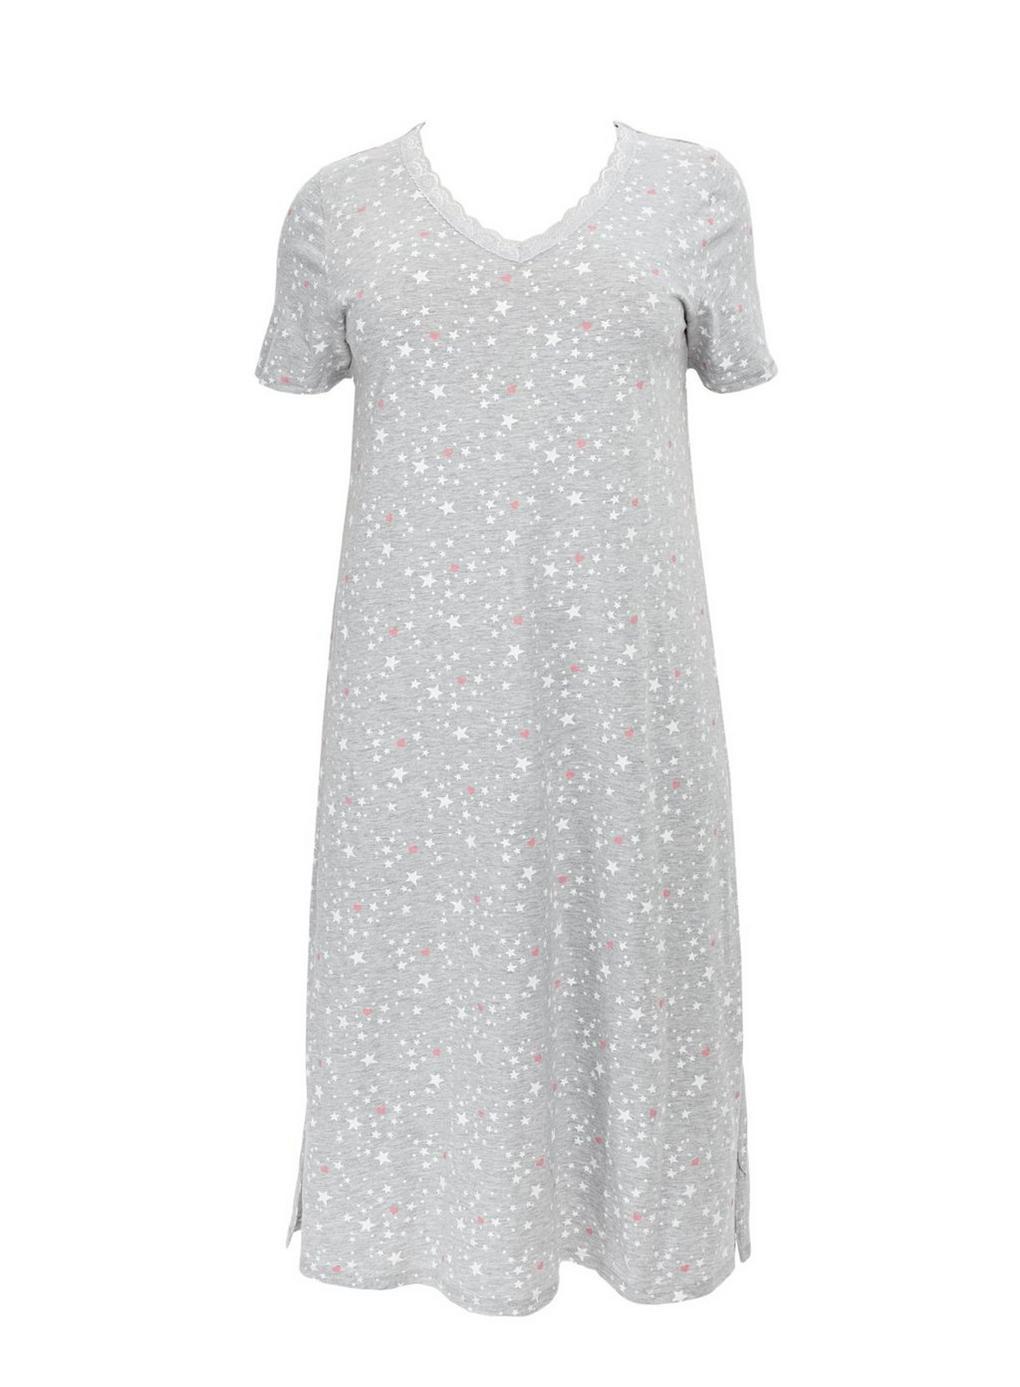 e81b621cf0 Evans Grey Star   Heart Printed Nightdress in Gray - Lyst